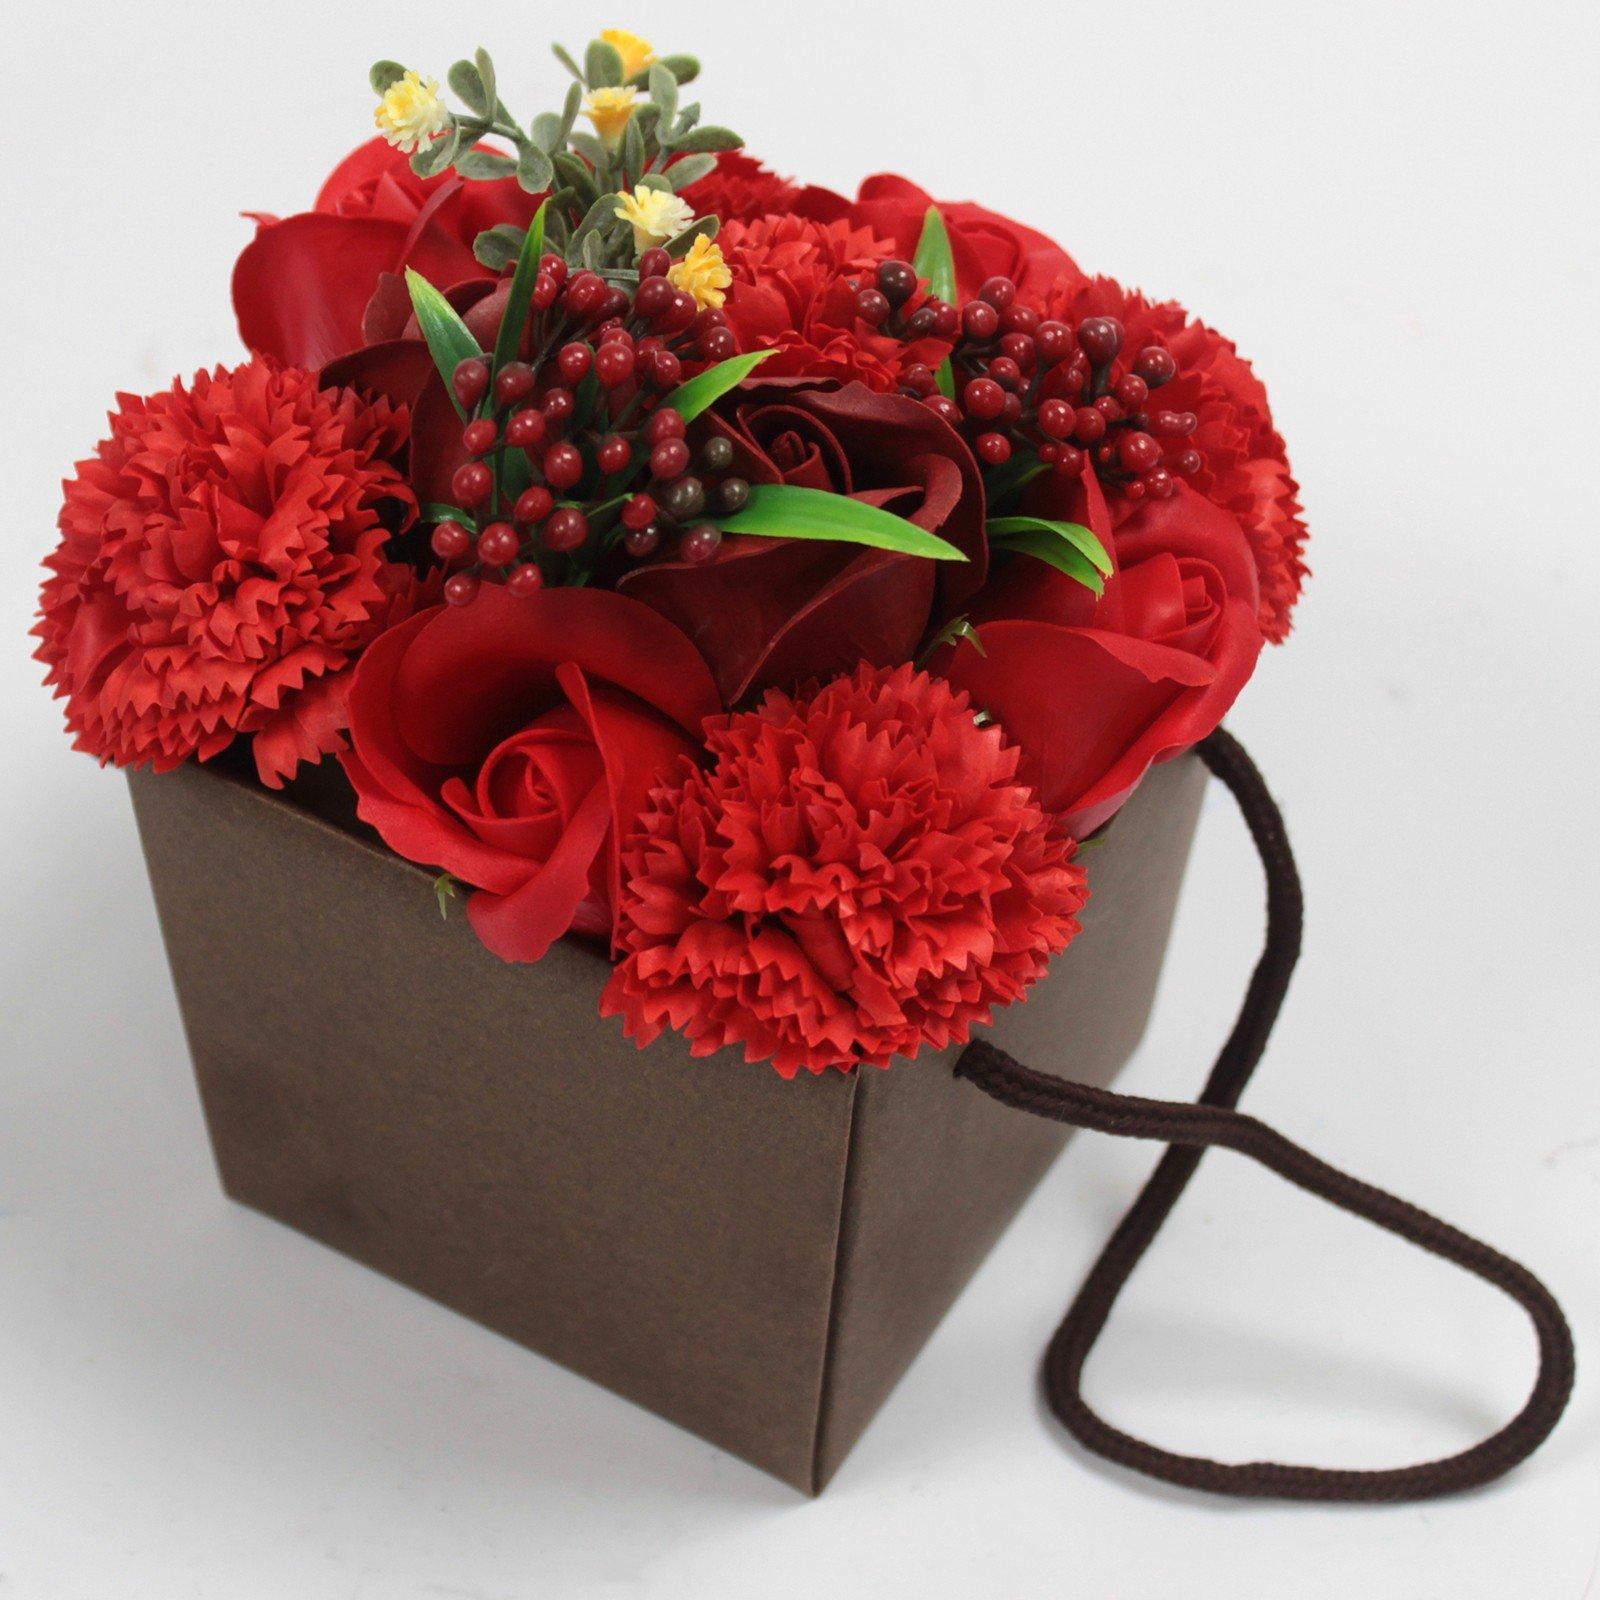 Soap Flower Bouquet Red rose & Carnation